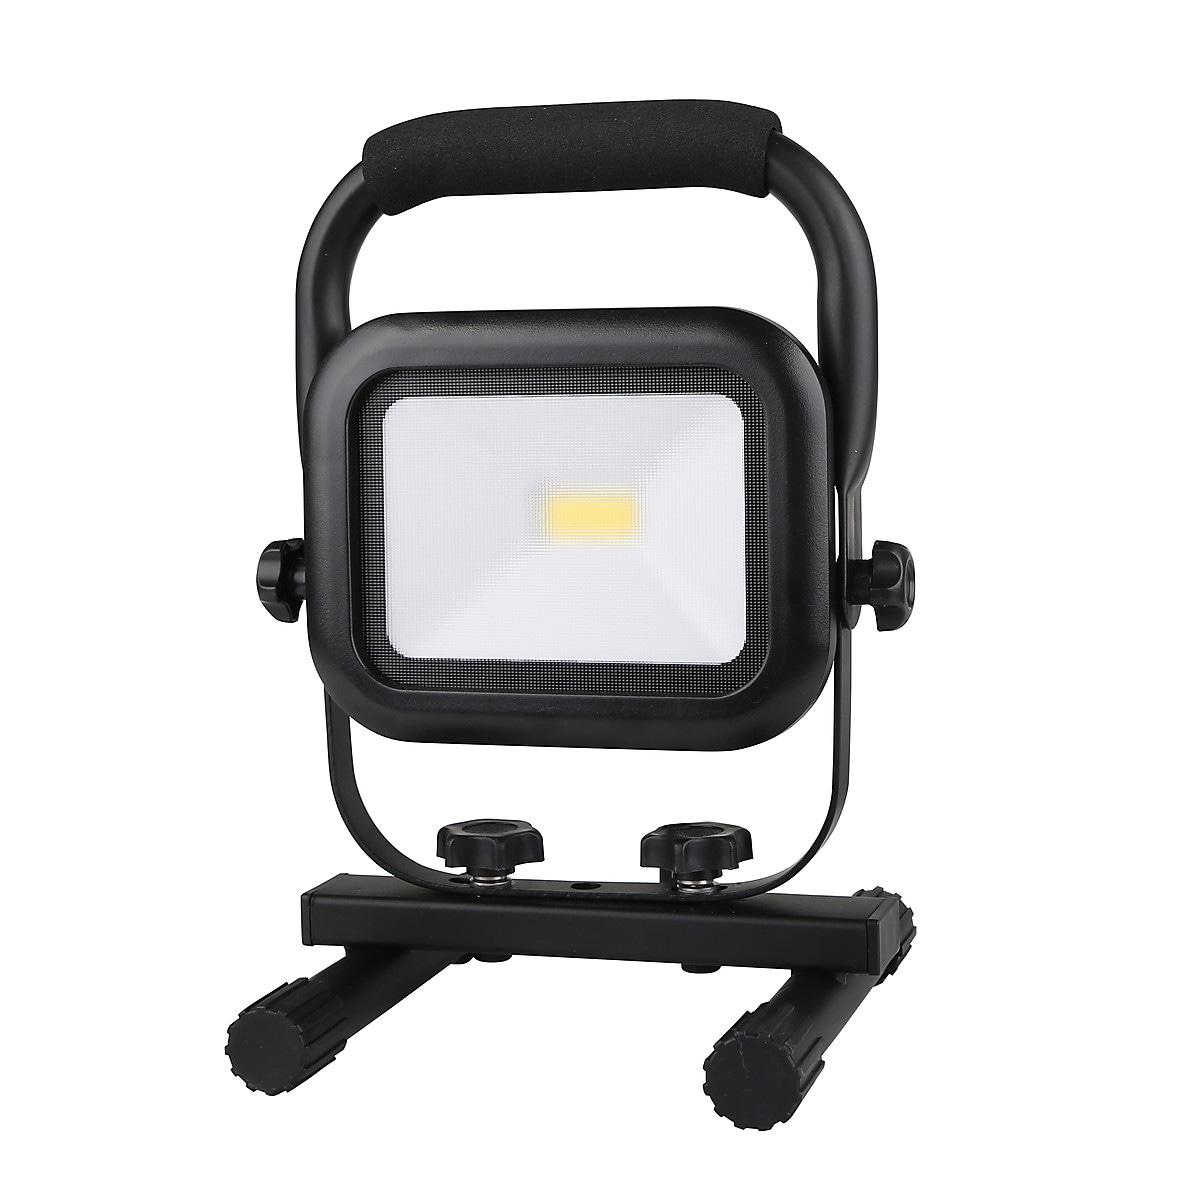 LED-valonheitin 15 W, 1270 lm